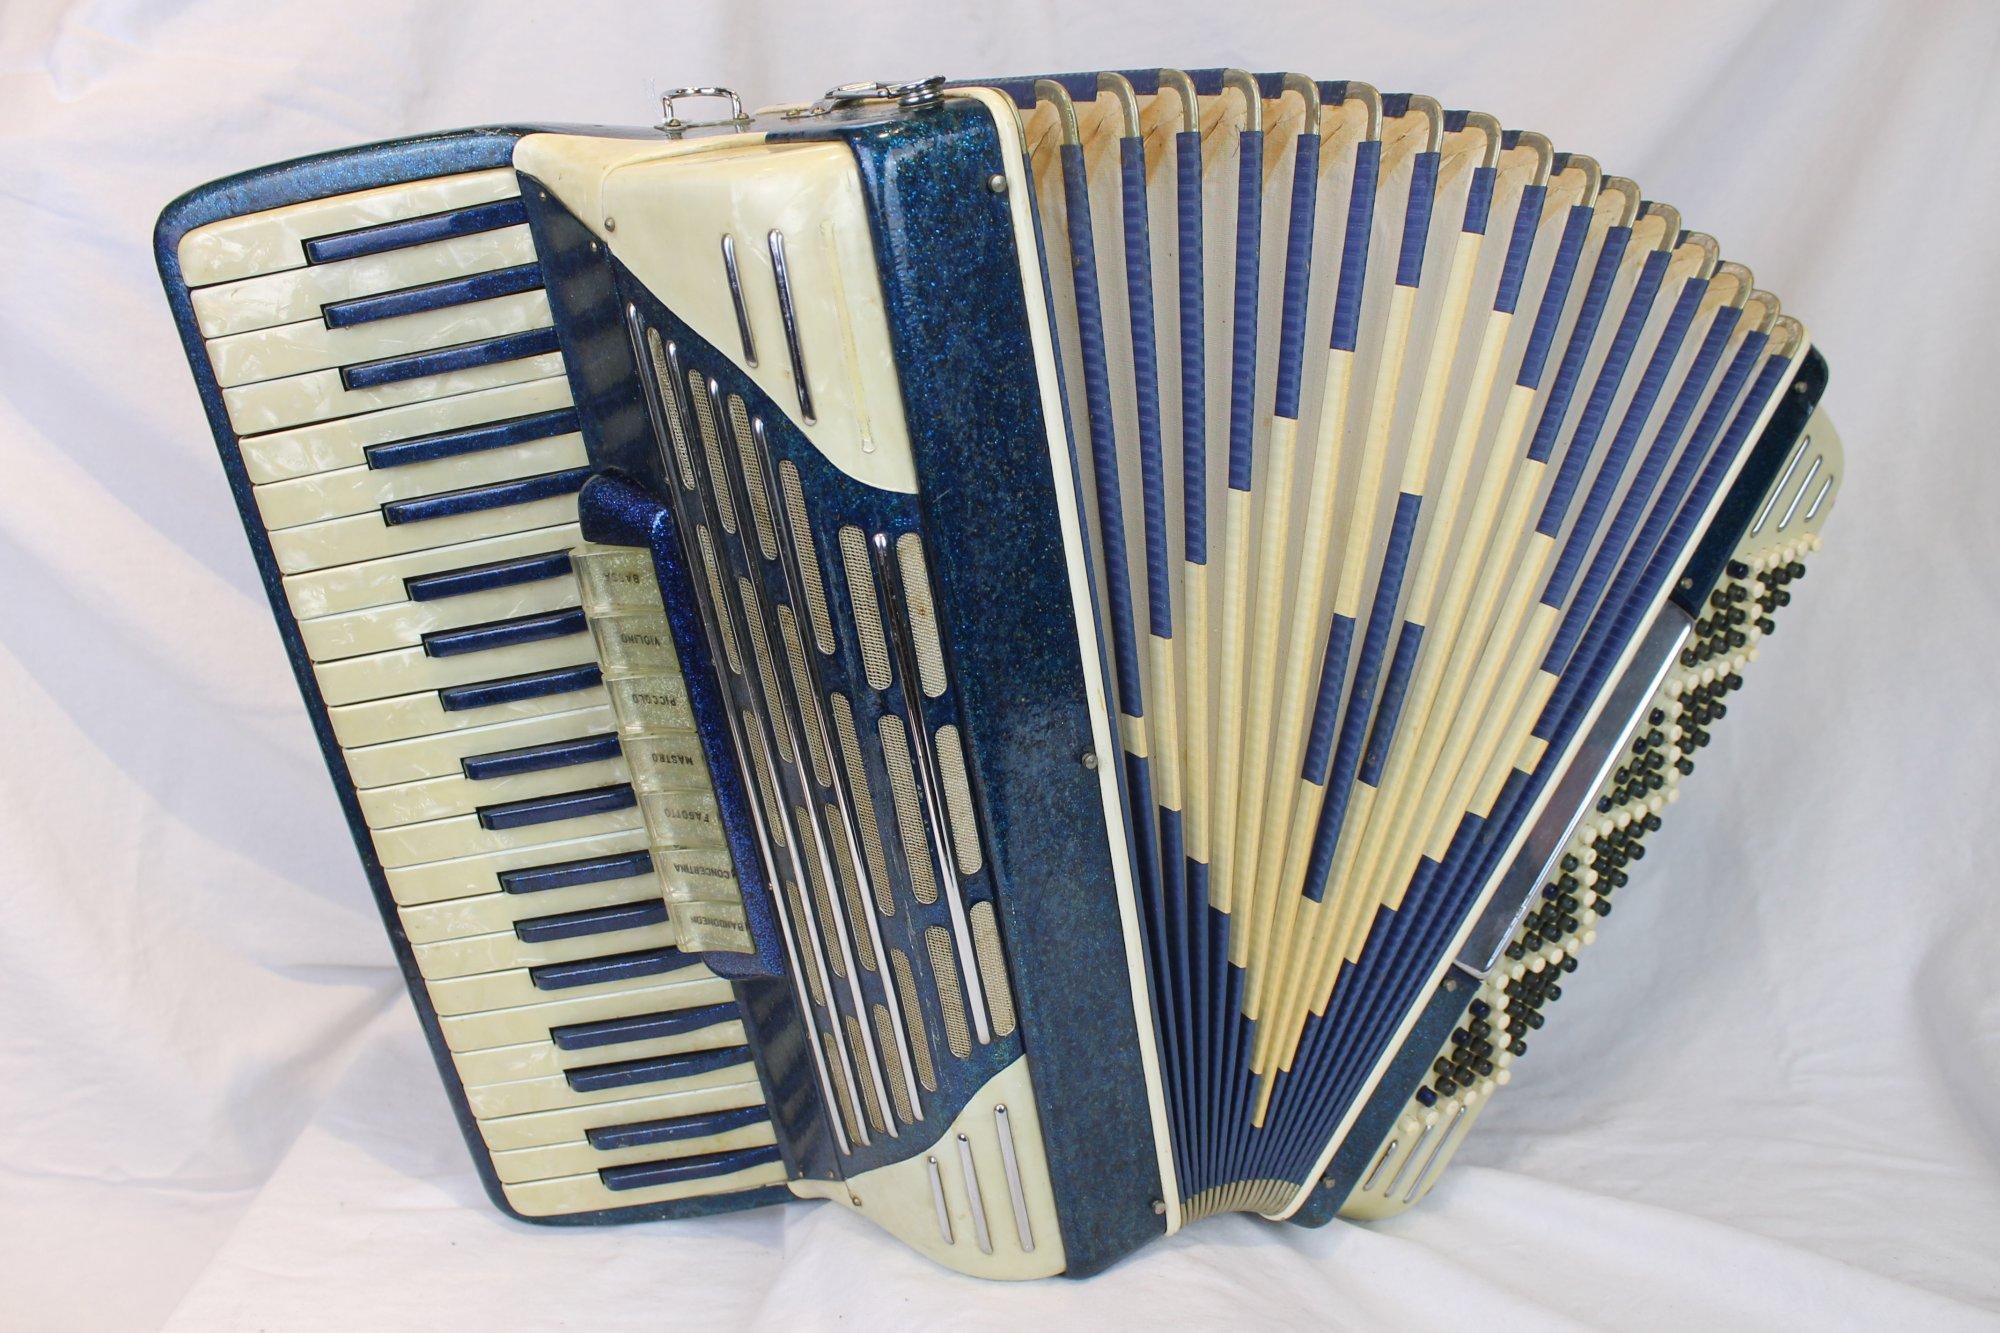 4231 - Blue Sparkle Italian Piano Accordion LMH 41 120